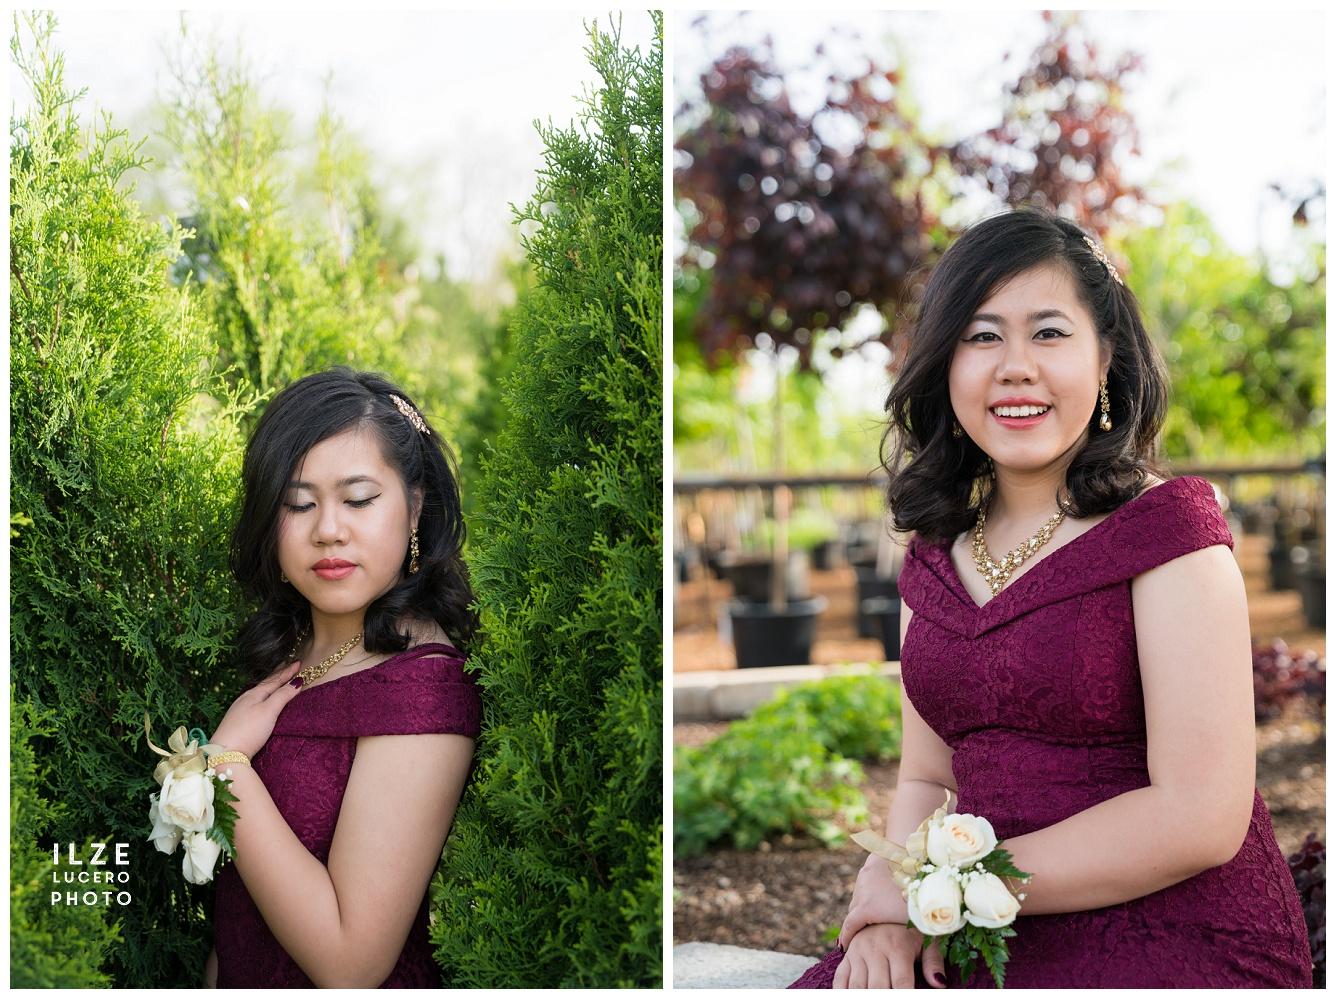 Senior Prom photos